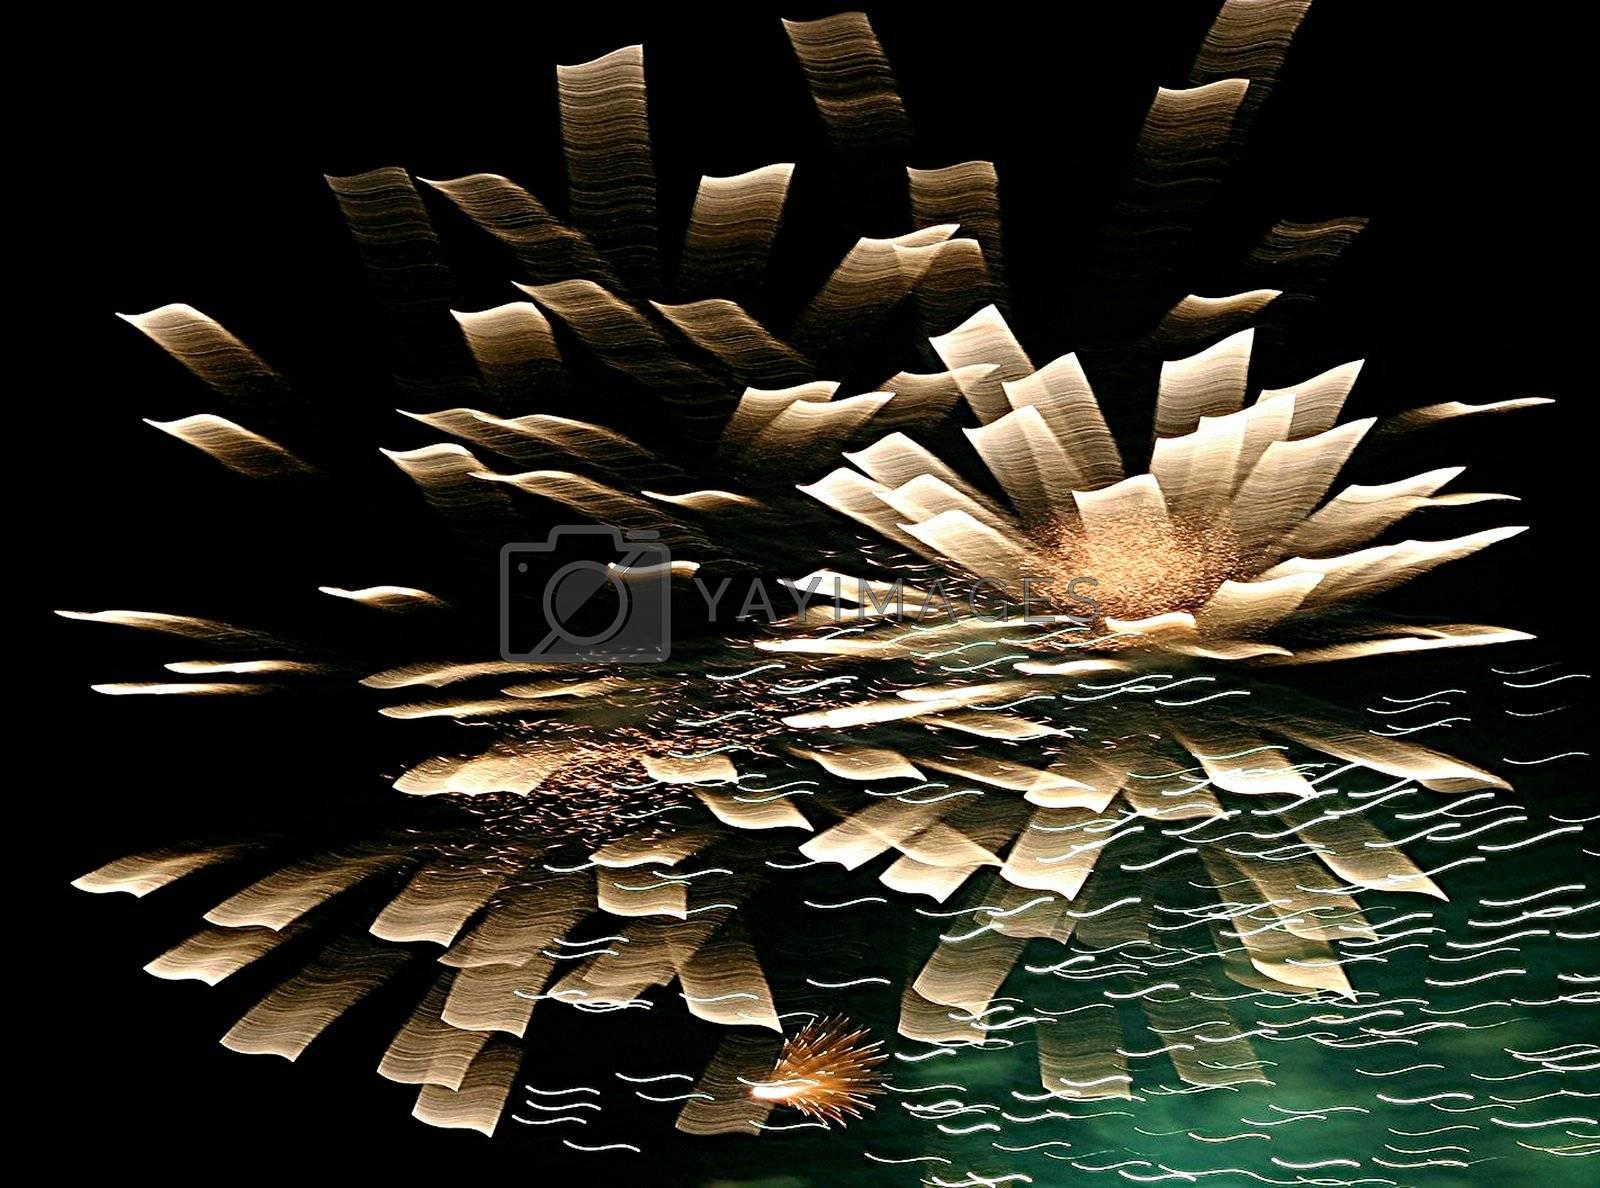 Splash from fireworks spreading like flower petals